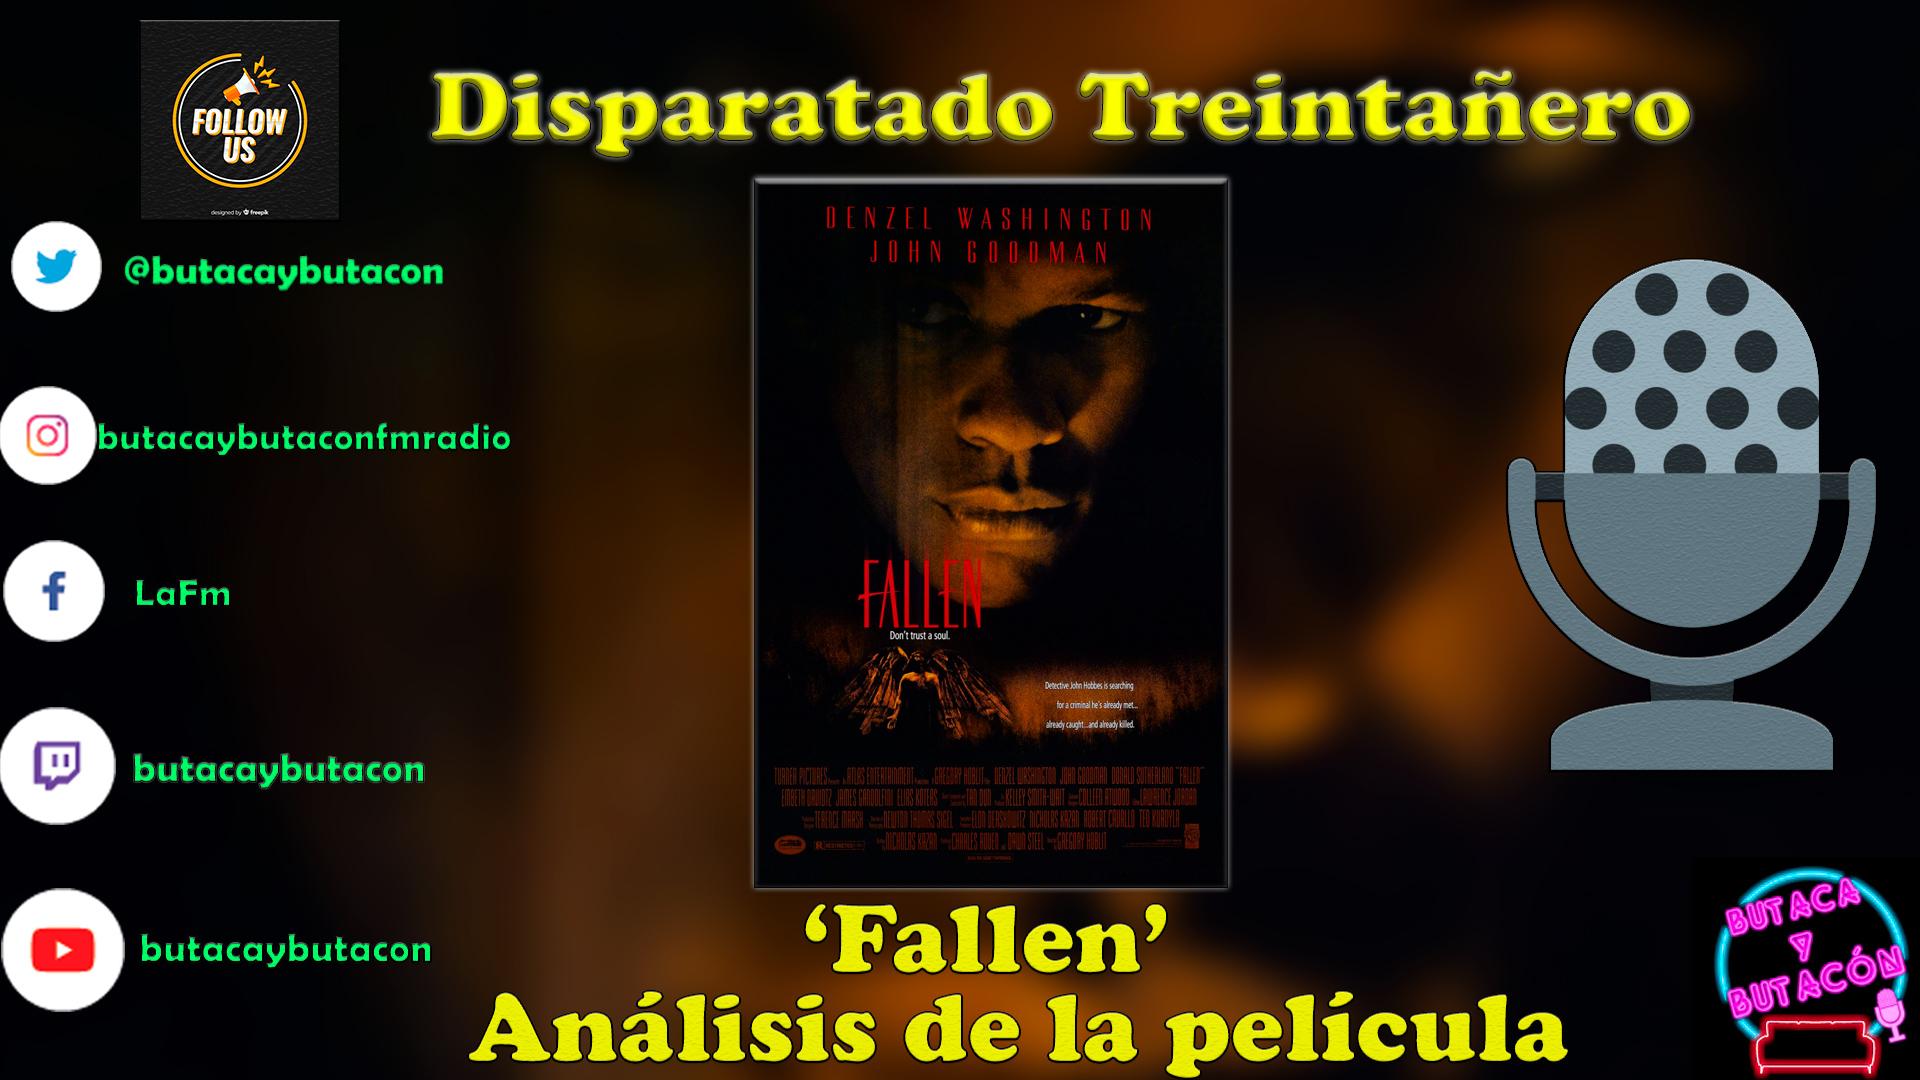 Disparatado Treintañero: 'Fallen'